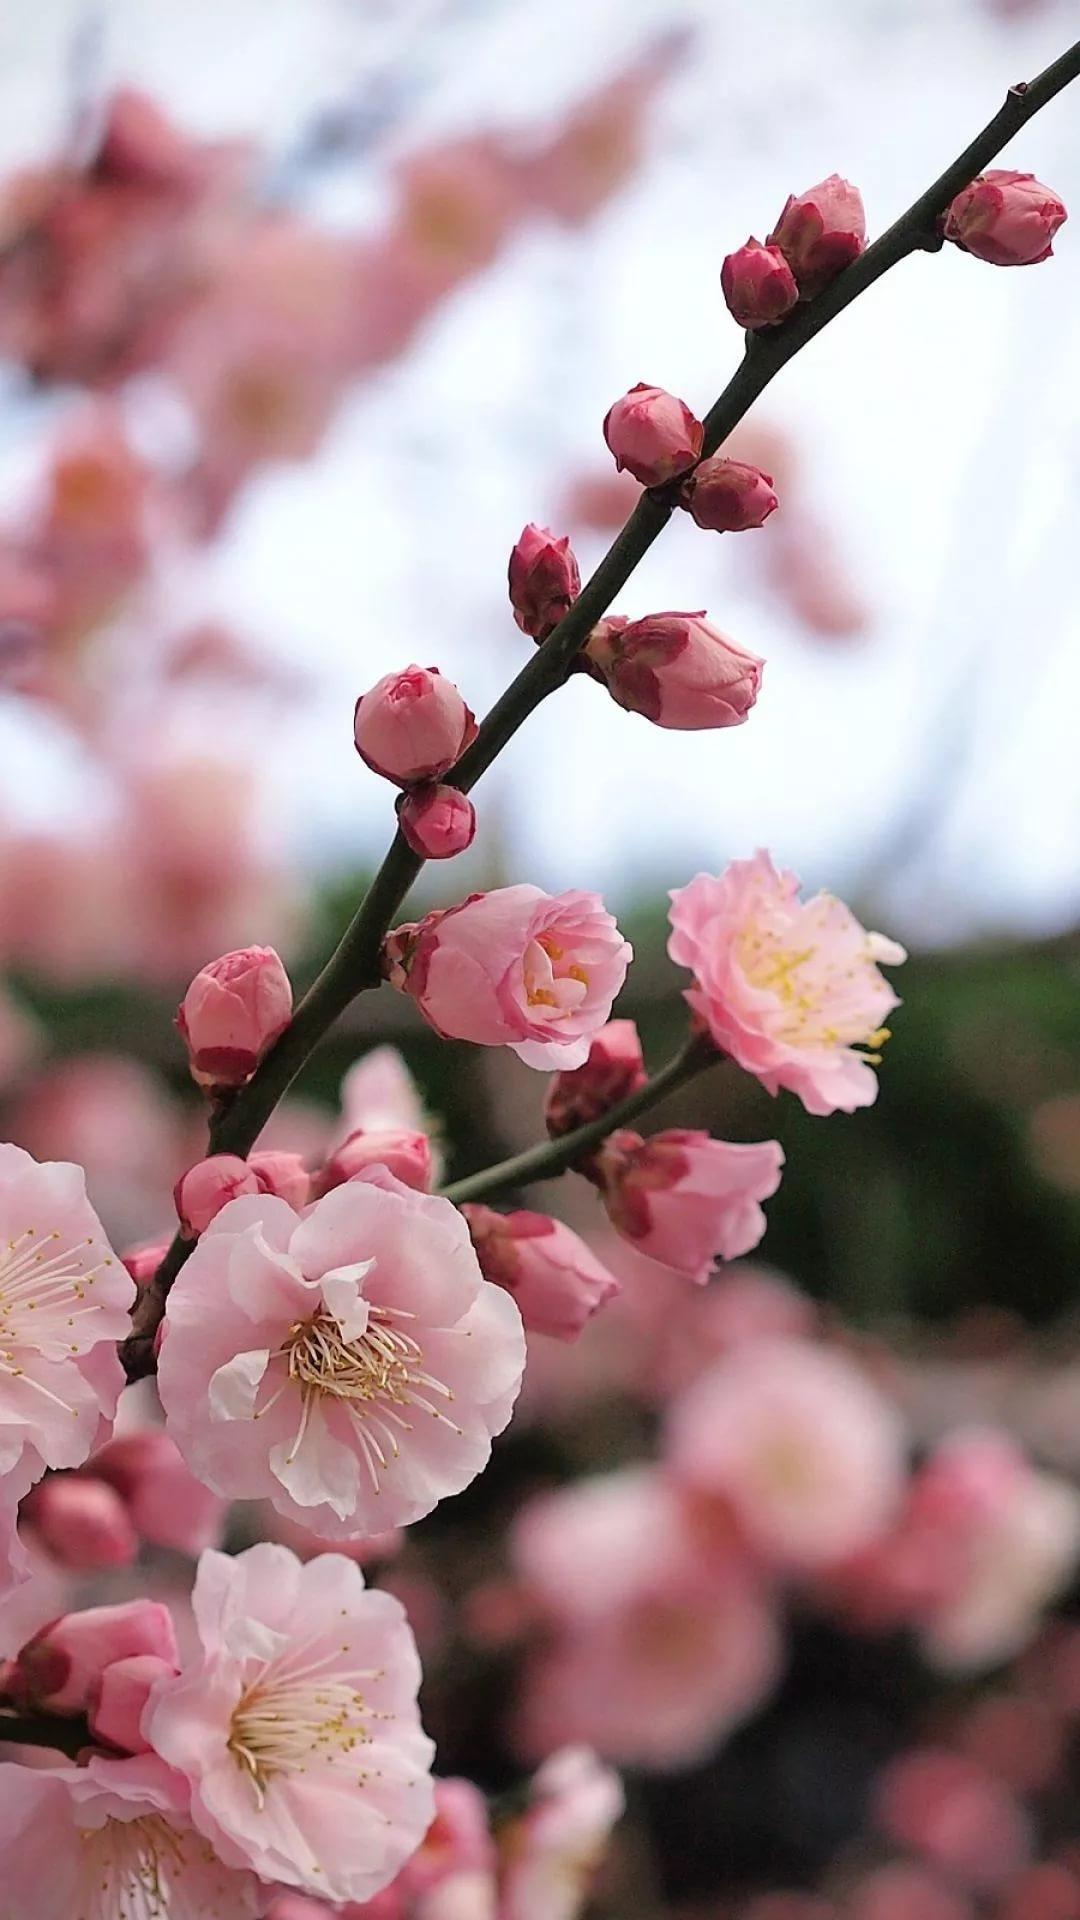 Красивые hd обои весна на телефон 10